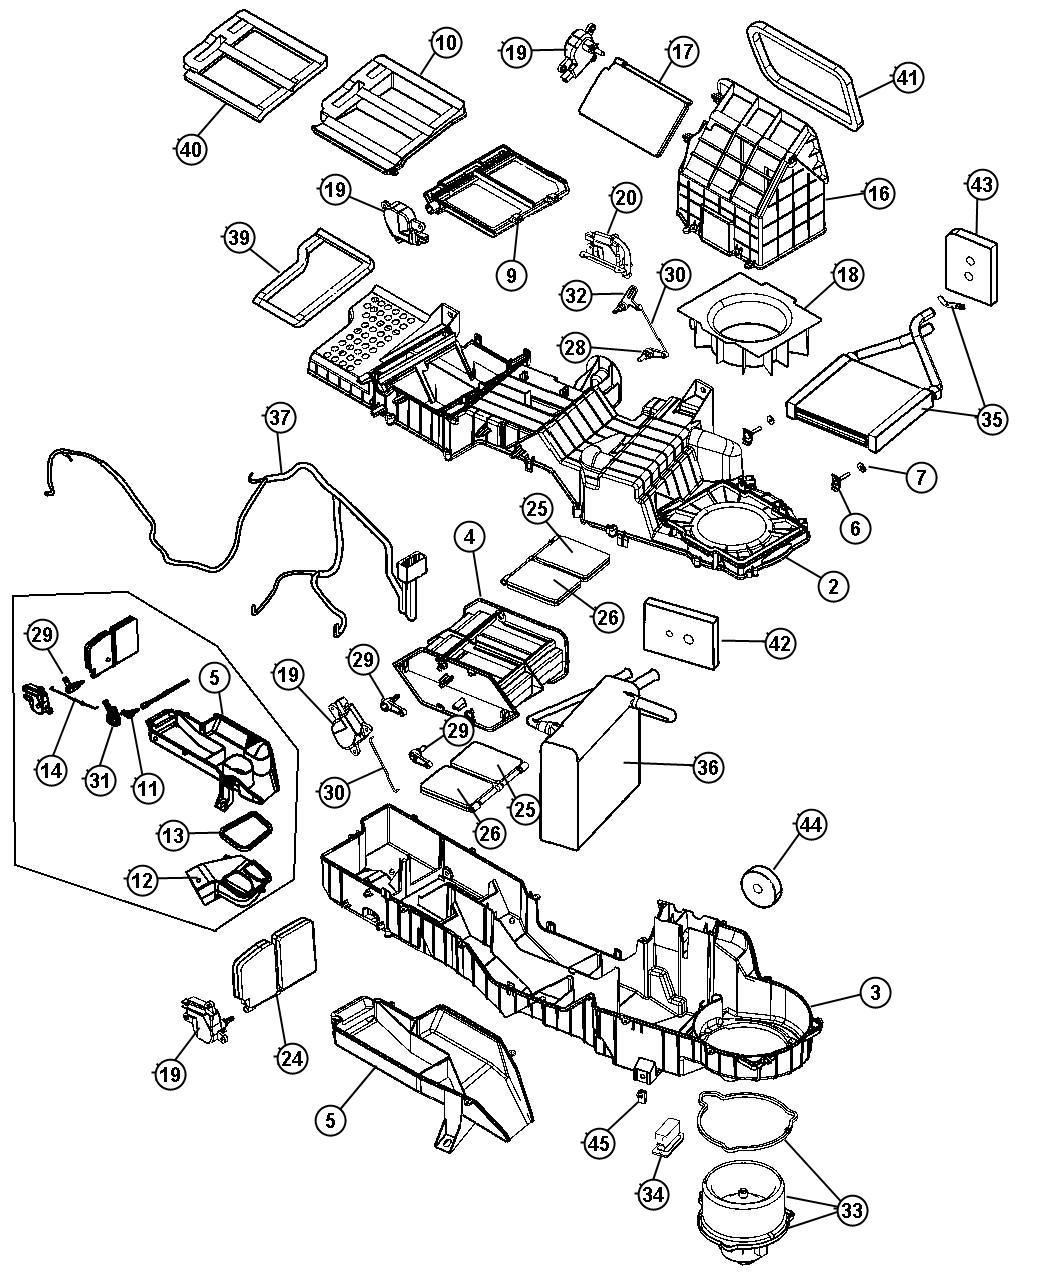 1997 dodge ram 1500 parts html